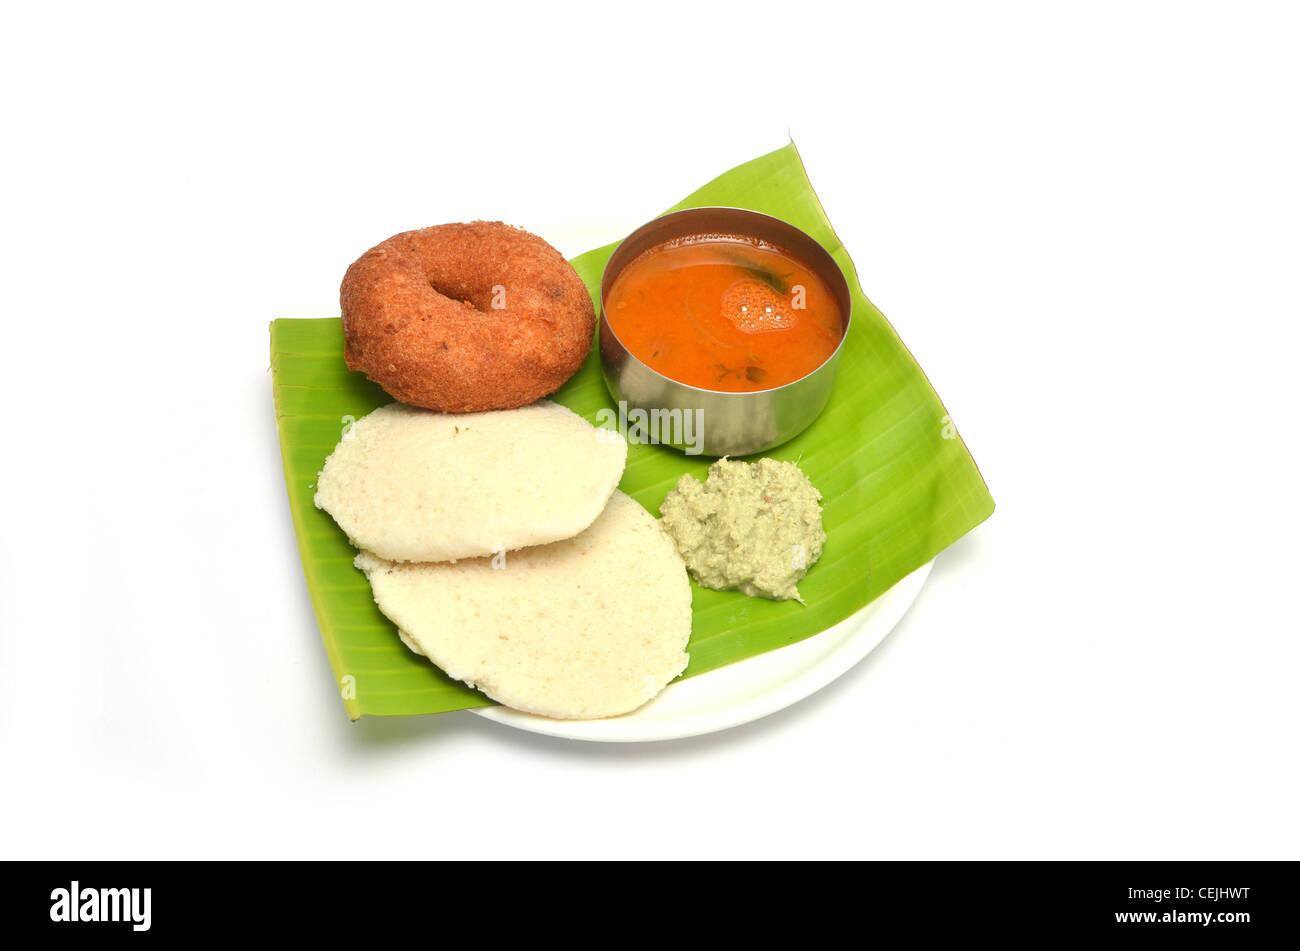 Idli, vada, sambar and chutney, south Indian breakfast served on banana leaf, isolated on white background Stock Photo